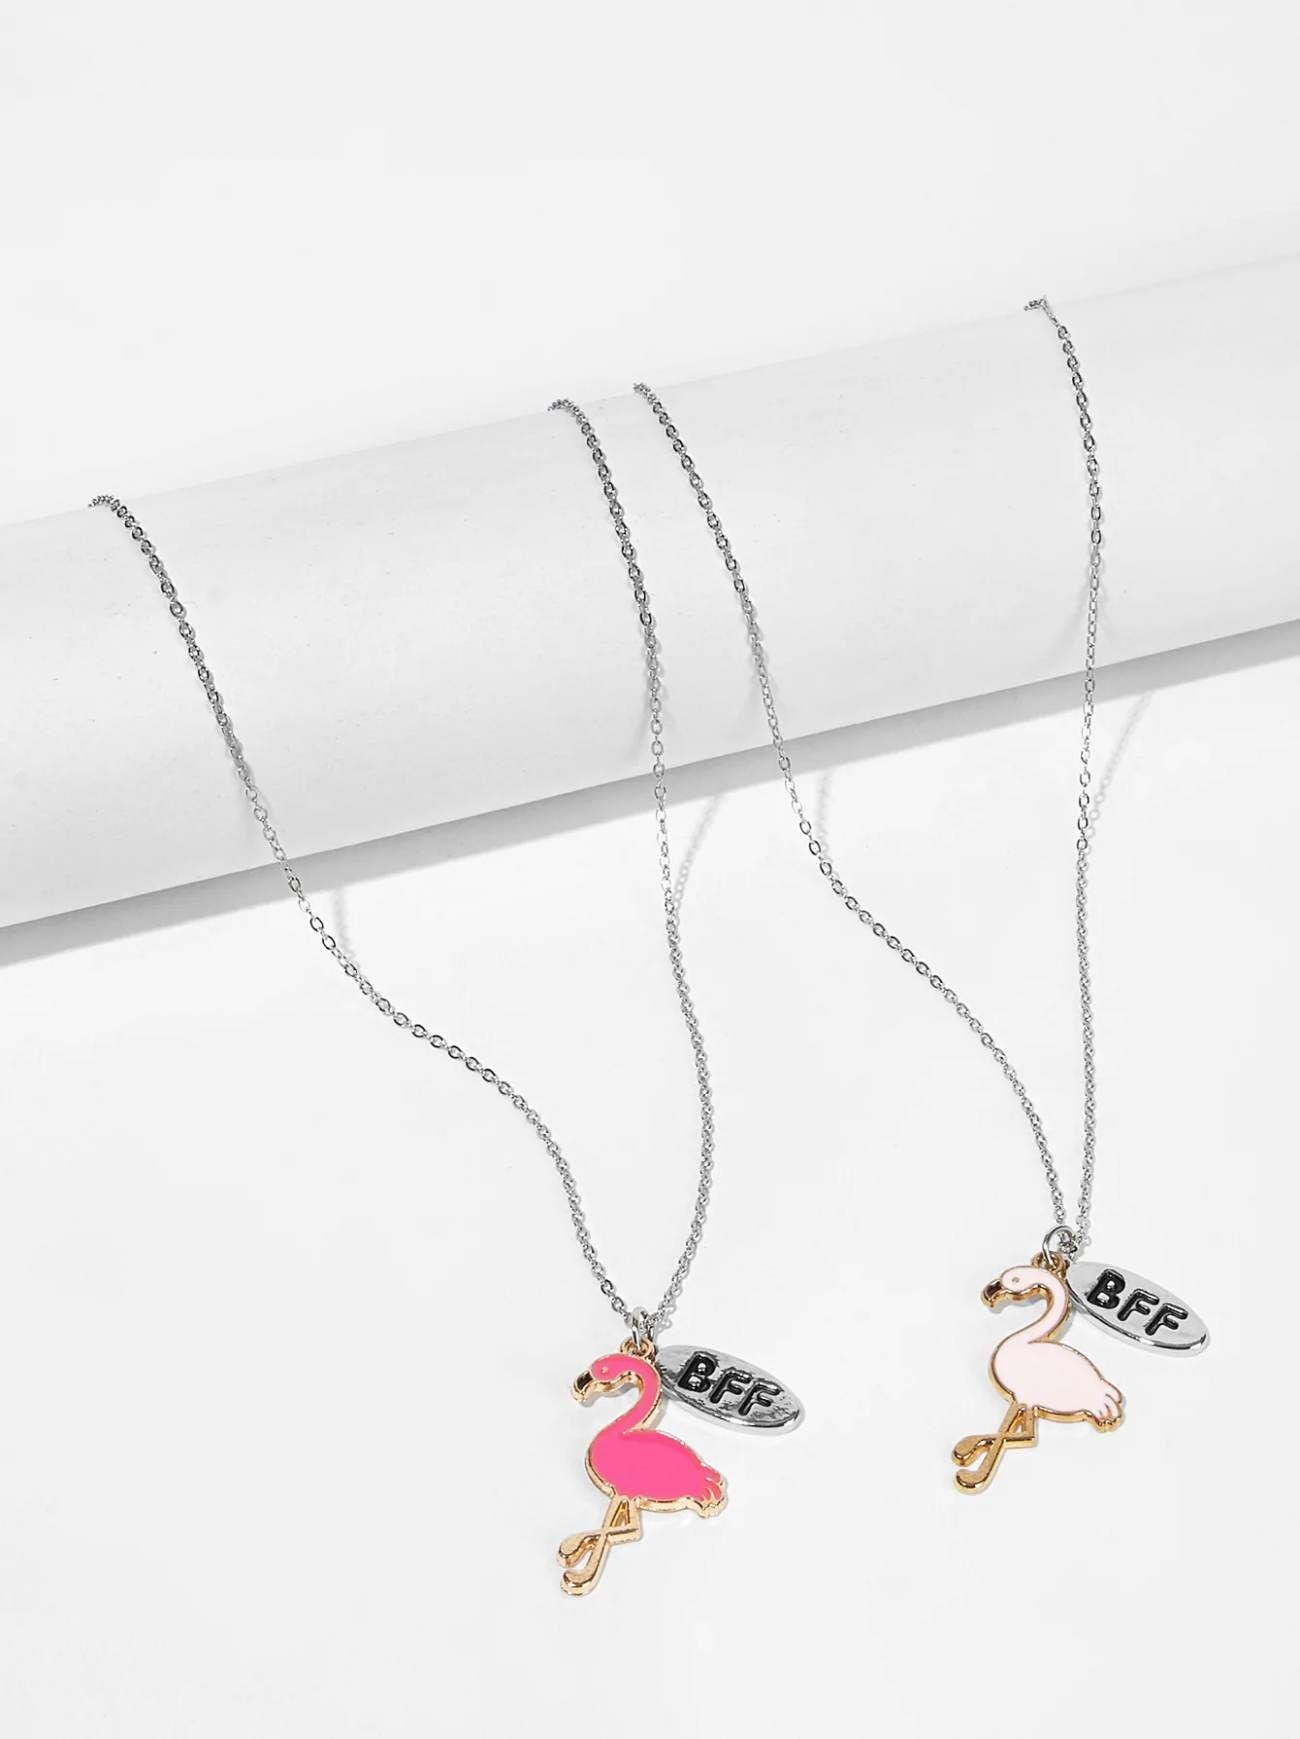 58e25287cd $3 - Girls Flamingo Pendant Necklace Set 2 PCs - Kids Jewelry #kids #jewelry